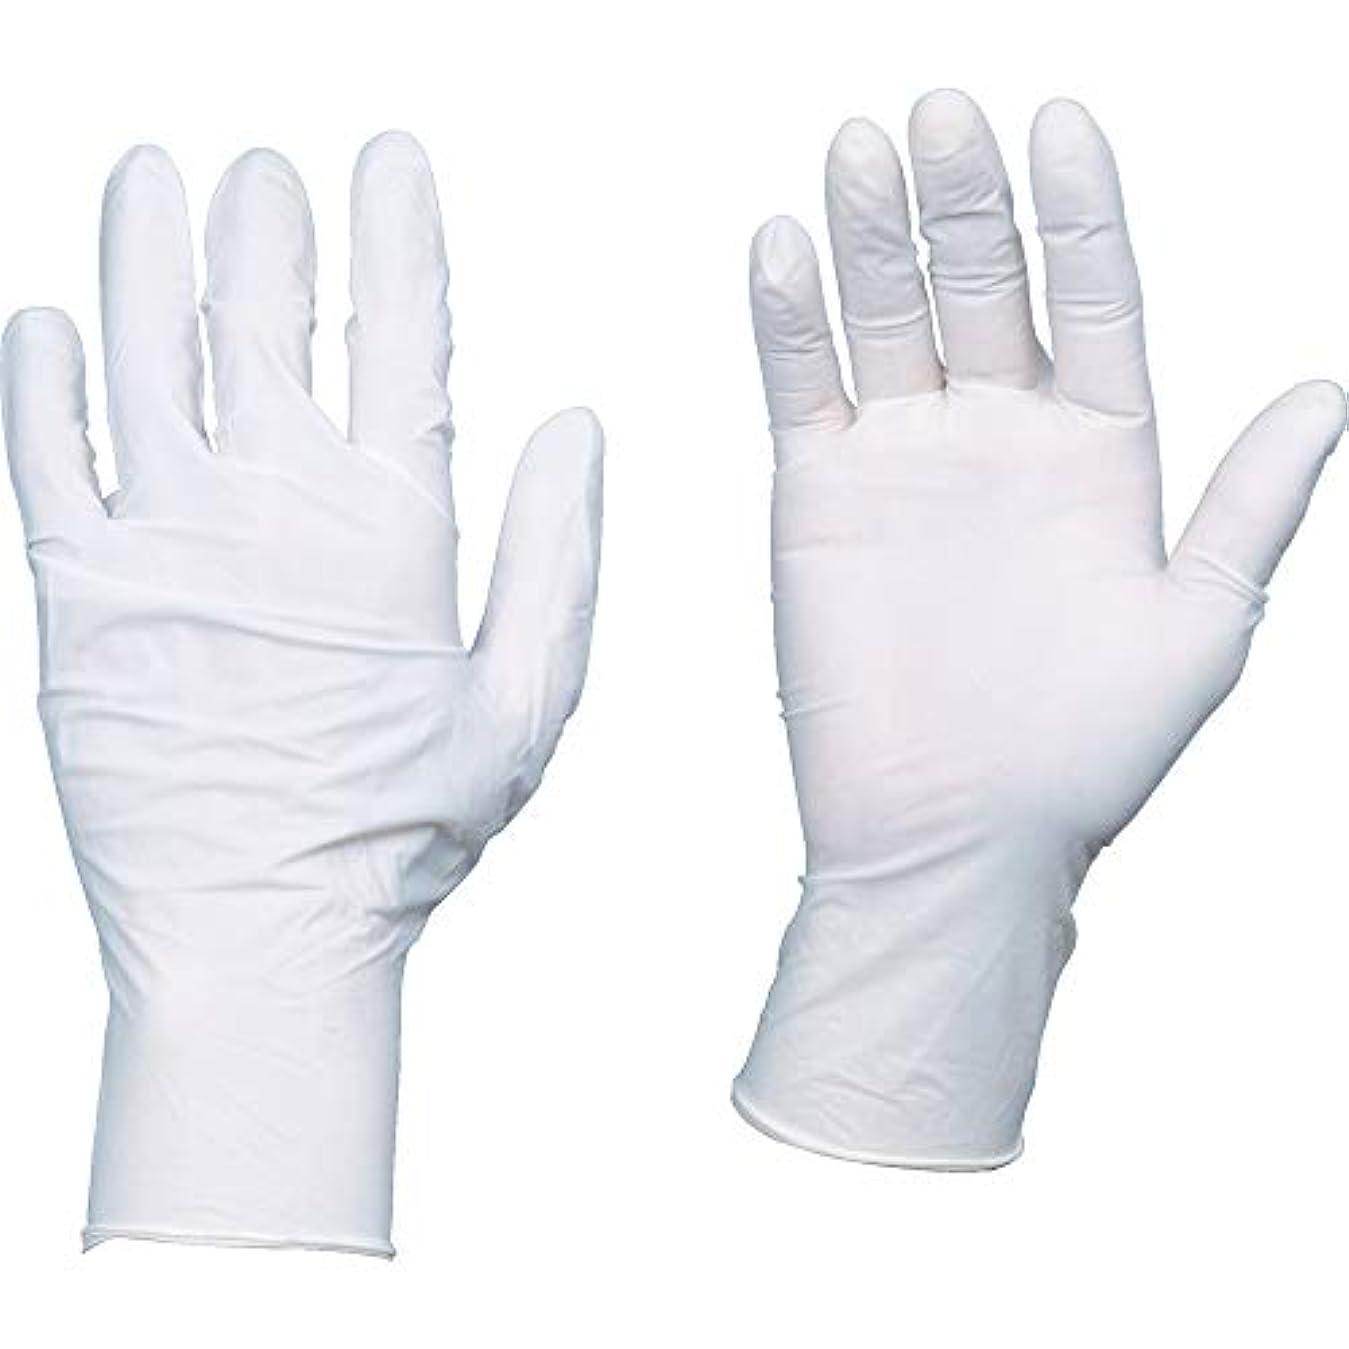 TRUSCO(トラスコ) 10箱入り 使い捨て天然ゴム手袋TGワーク 0.10 粉付白L TGPL10WL10C